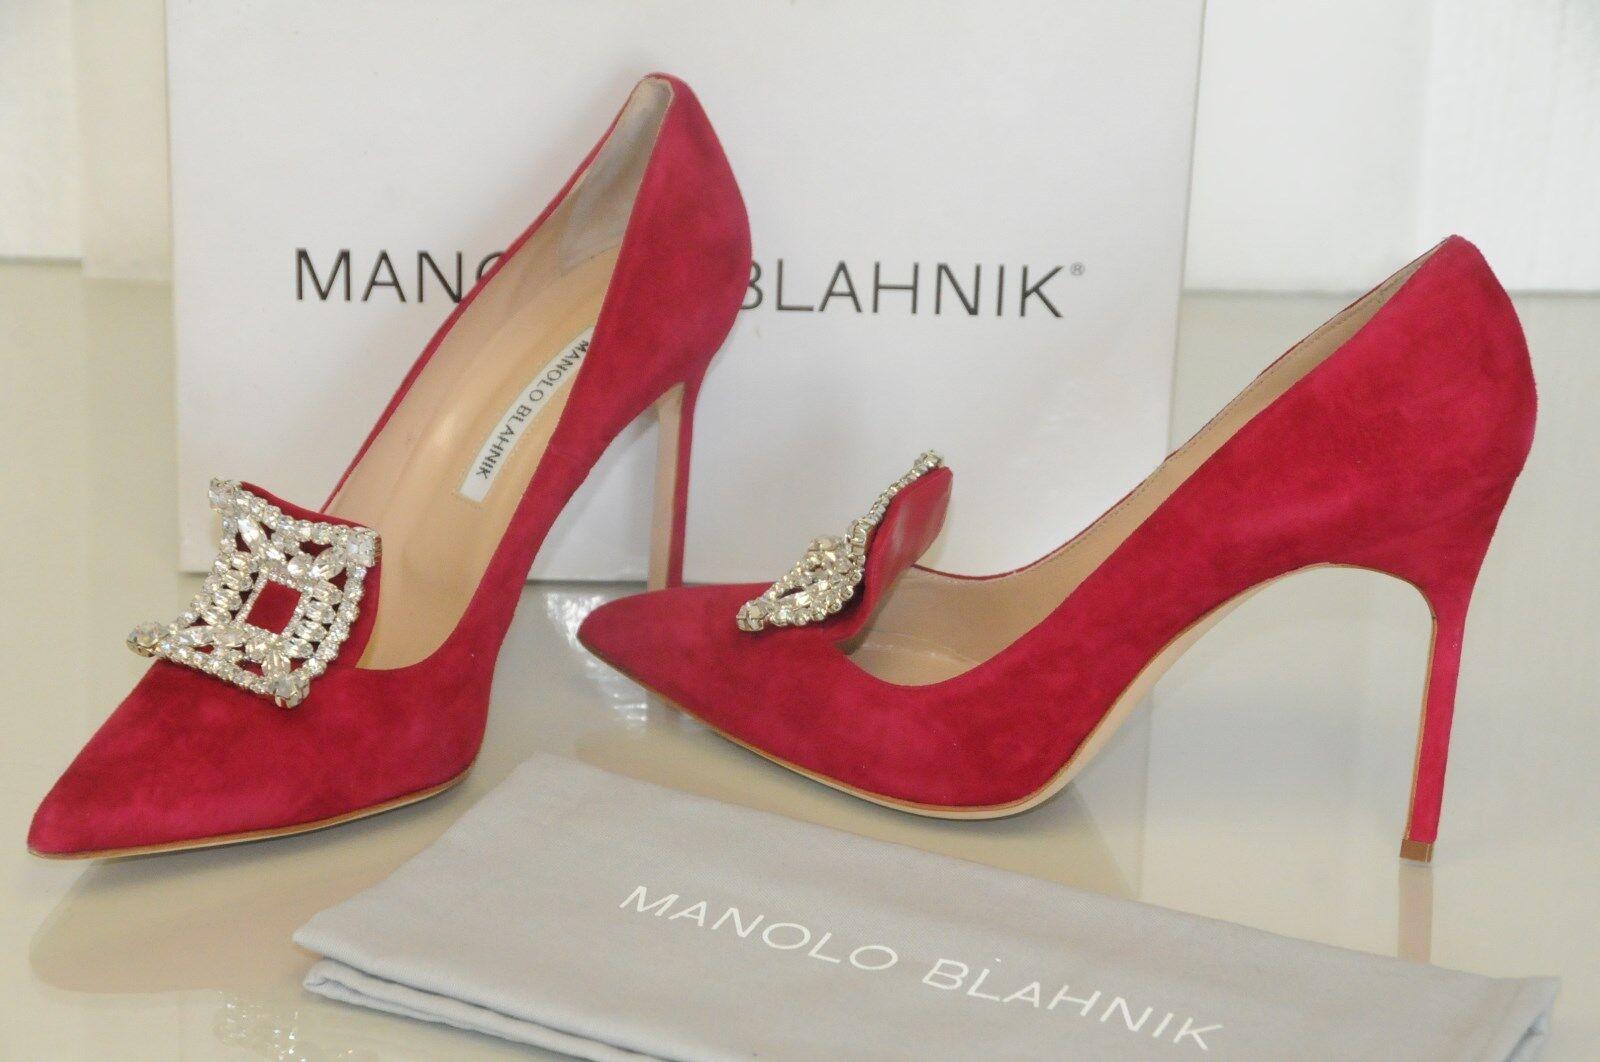 Neu Manolo Blahnik Borlak Rot Himbeere Jeweled Kristallen Schuhe 40.5 41.5